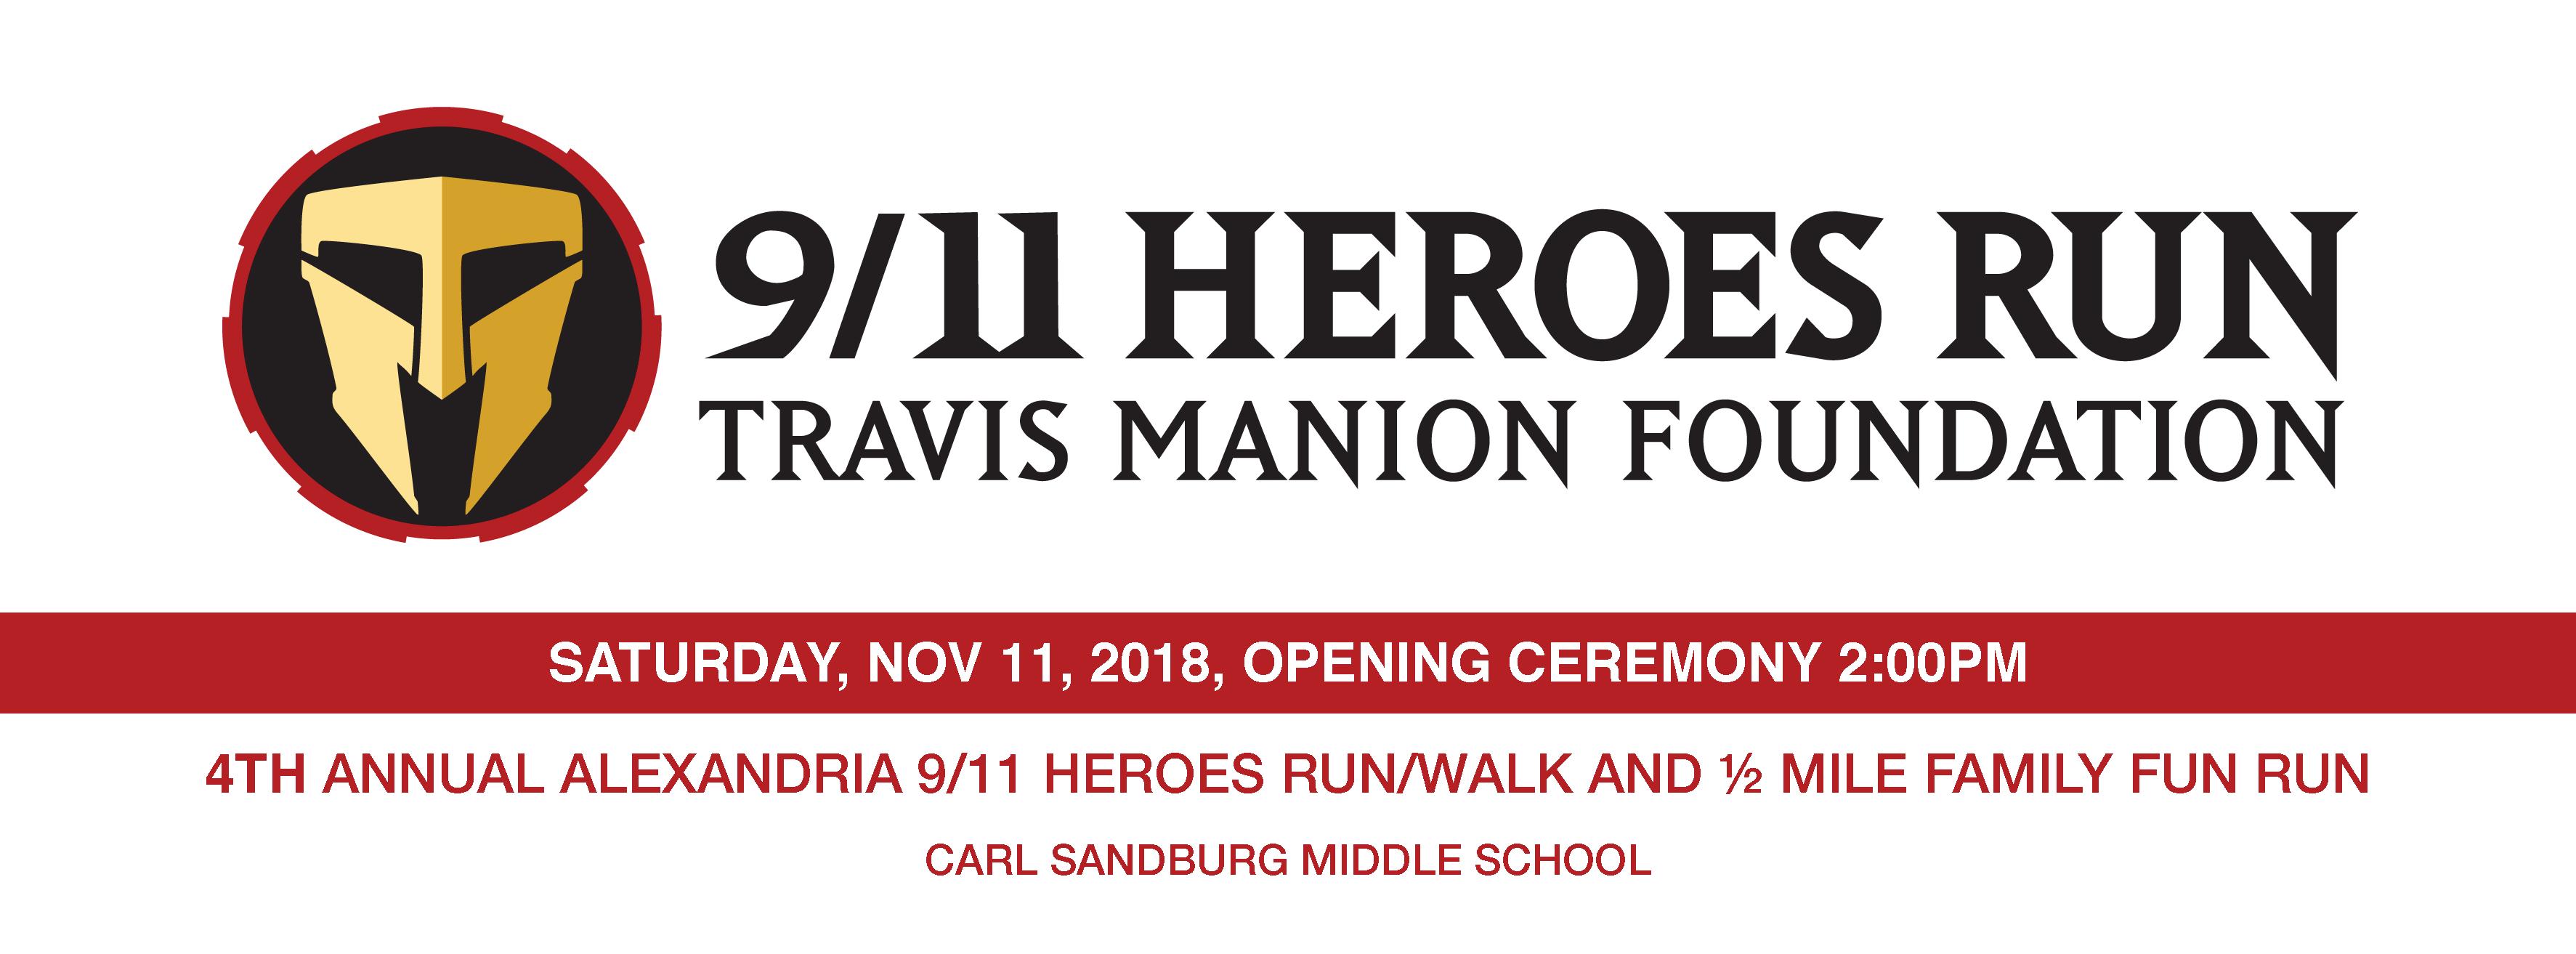 9/11 Heroes Run/Walk - Alexandria Virginia